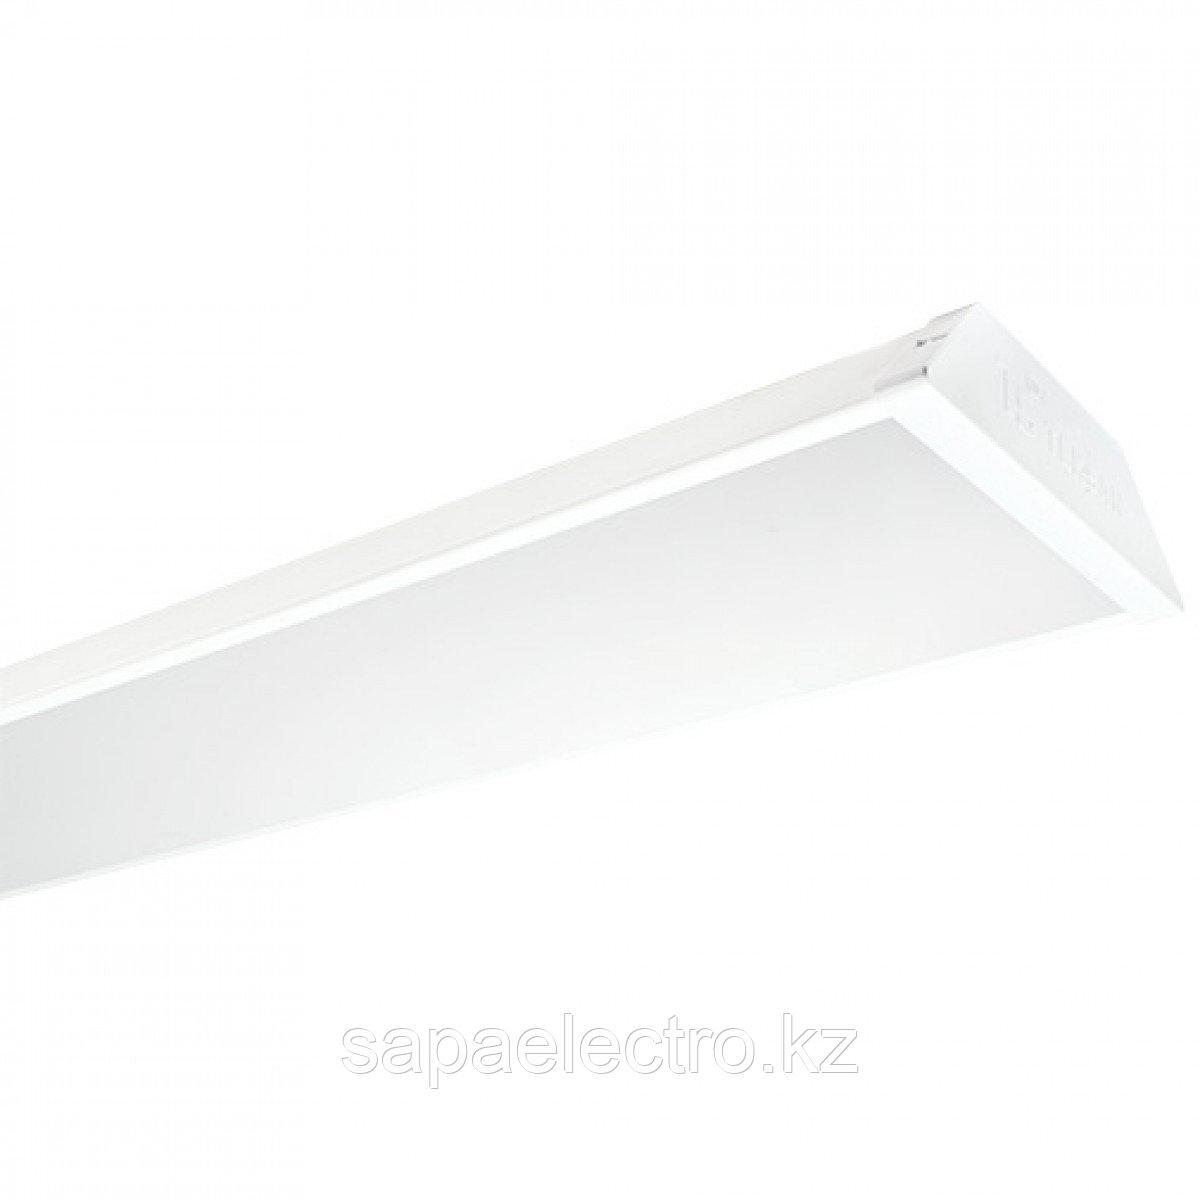 Св-к LEDTUBE LINEAR OPAL 2x18W+лампа (120см) IP20 M